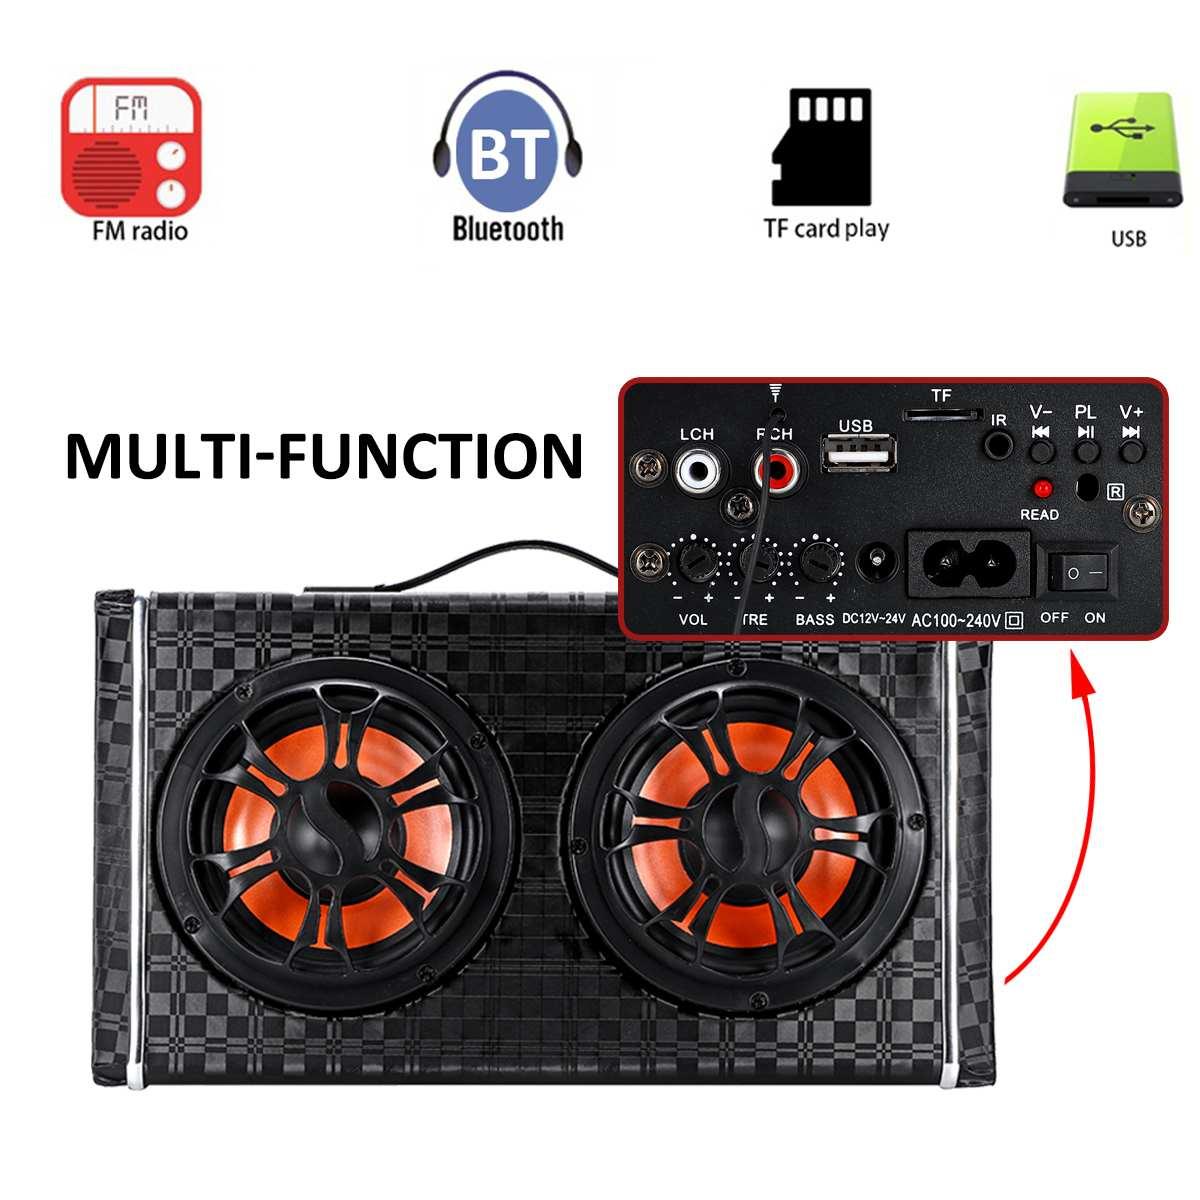 6 zoll DC 12 V/24 V Wireless bluetooth Auto Stereo Verstärker Subwoofer Lautsprecher AC 100-240V home Audio FM Radio Player Lautsprecher